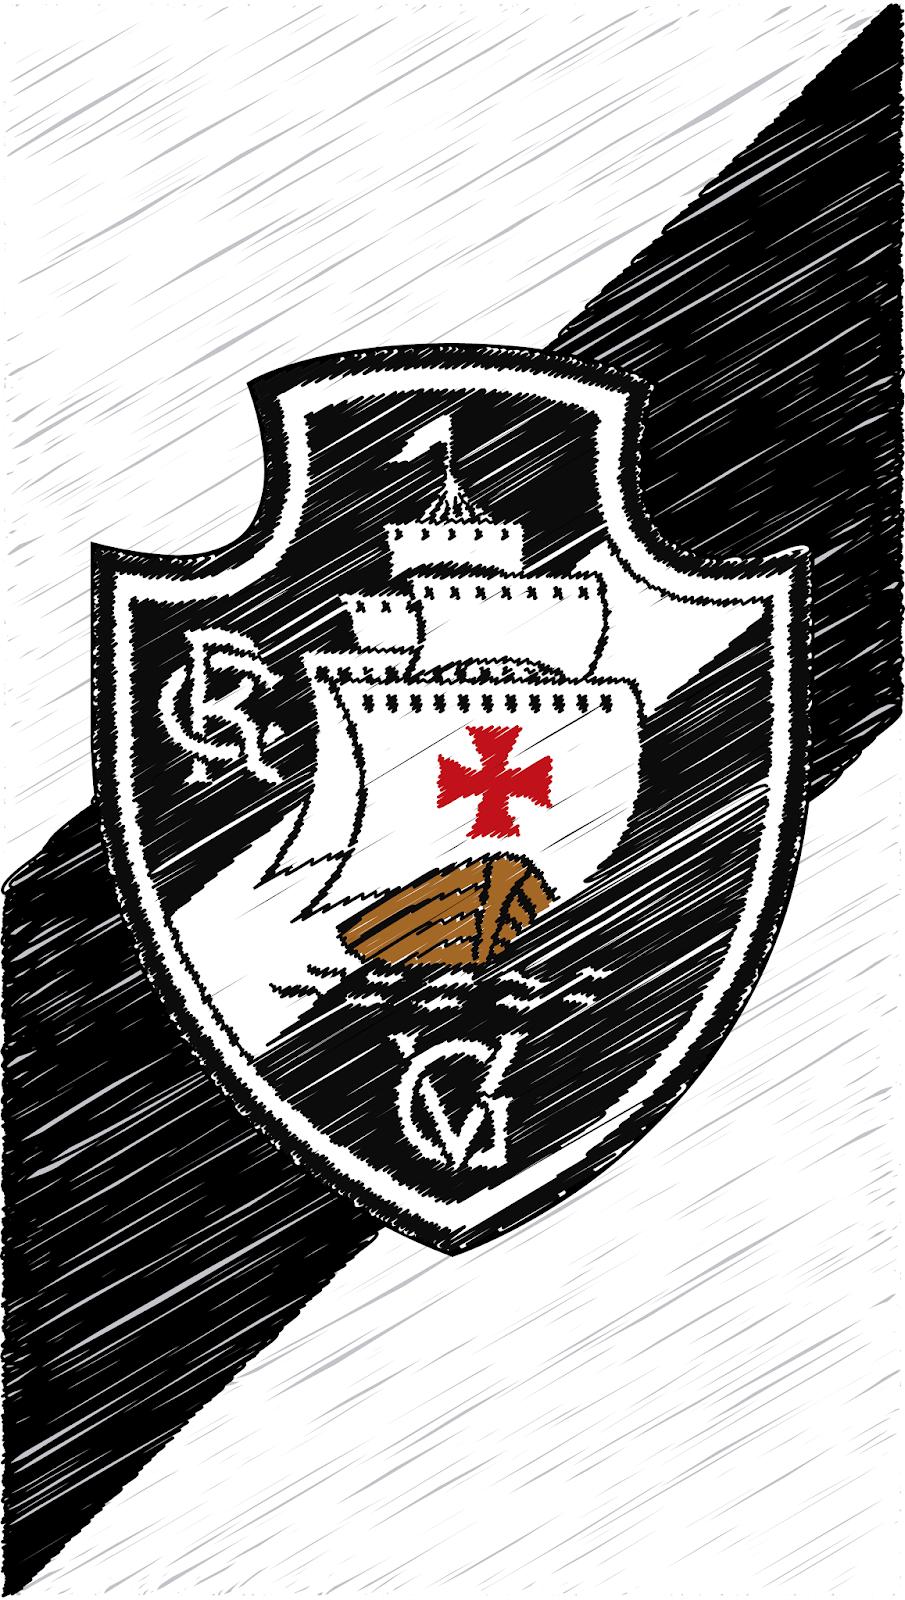 Baixar Wallpaper Para Celular Gratis Vasco Da Gama Rabiscado